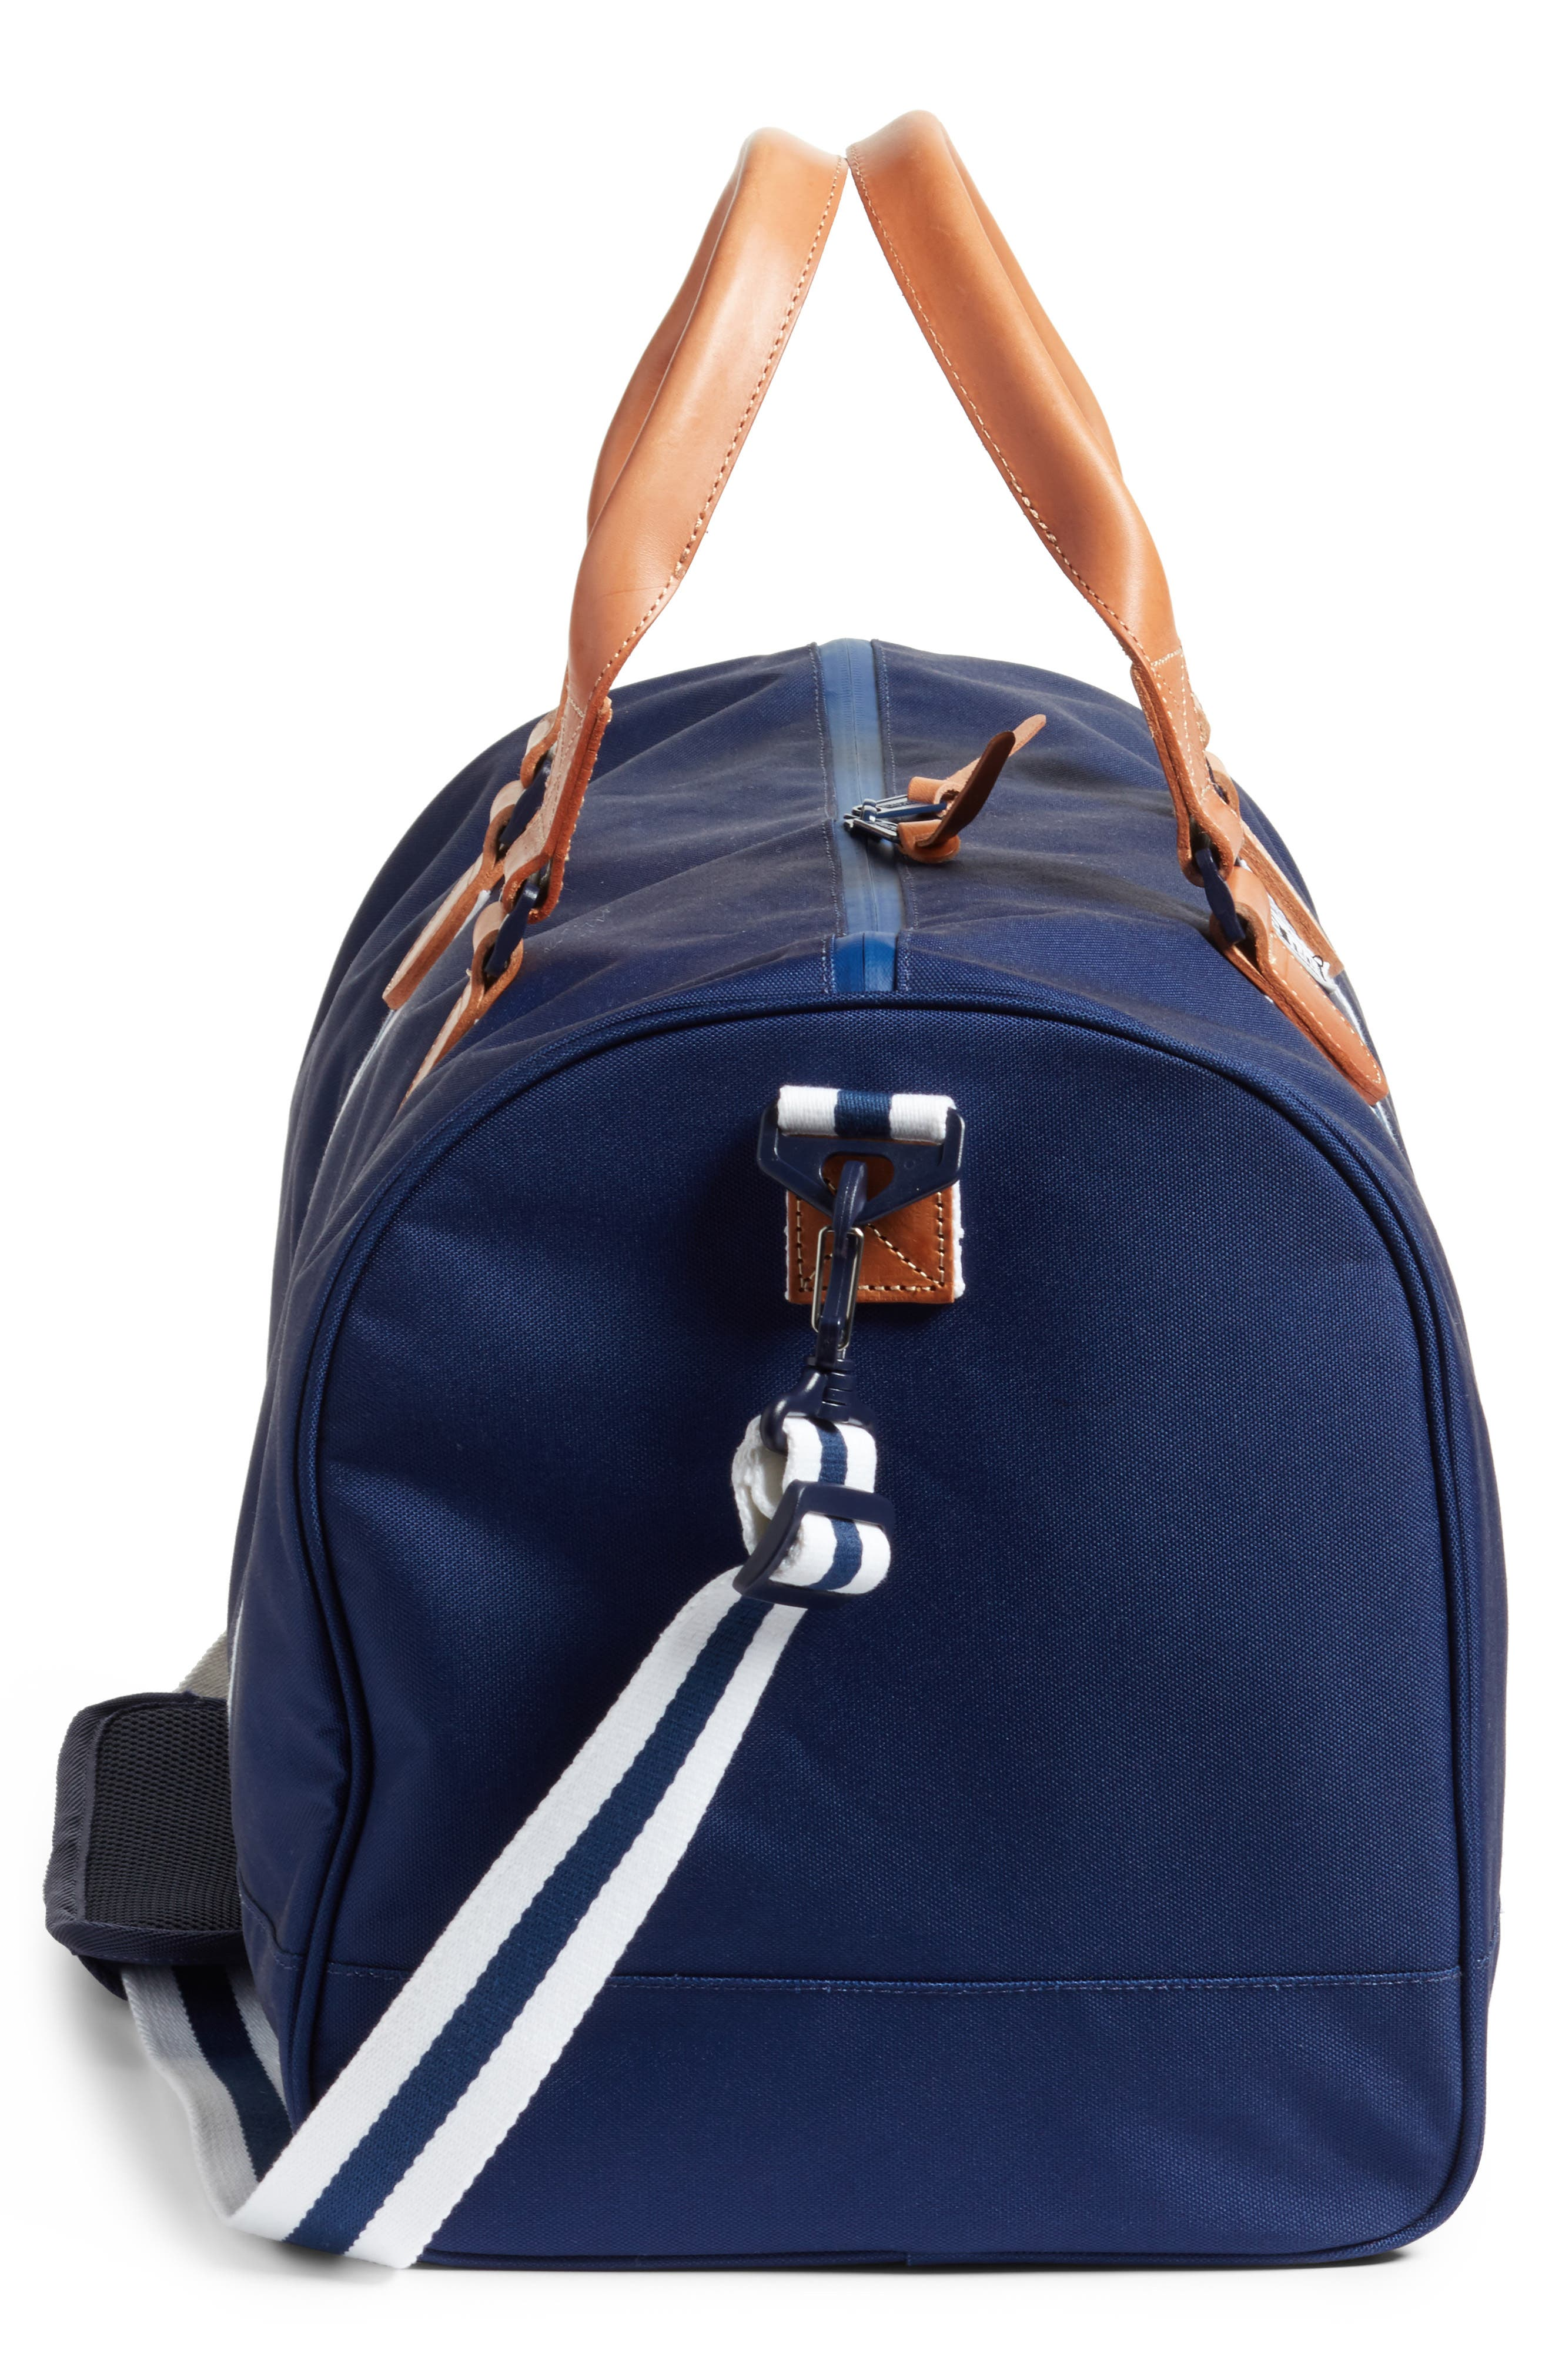 Novel Duffel Bag,                             Alternate thumbnail 4, color,                             Blue Depths